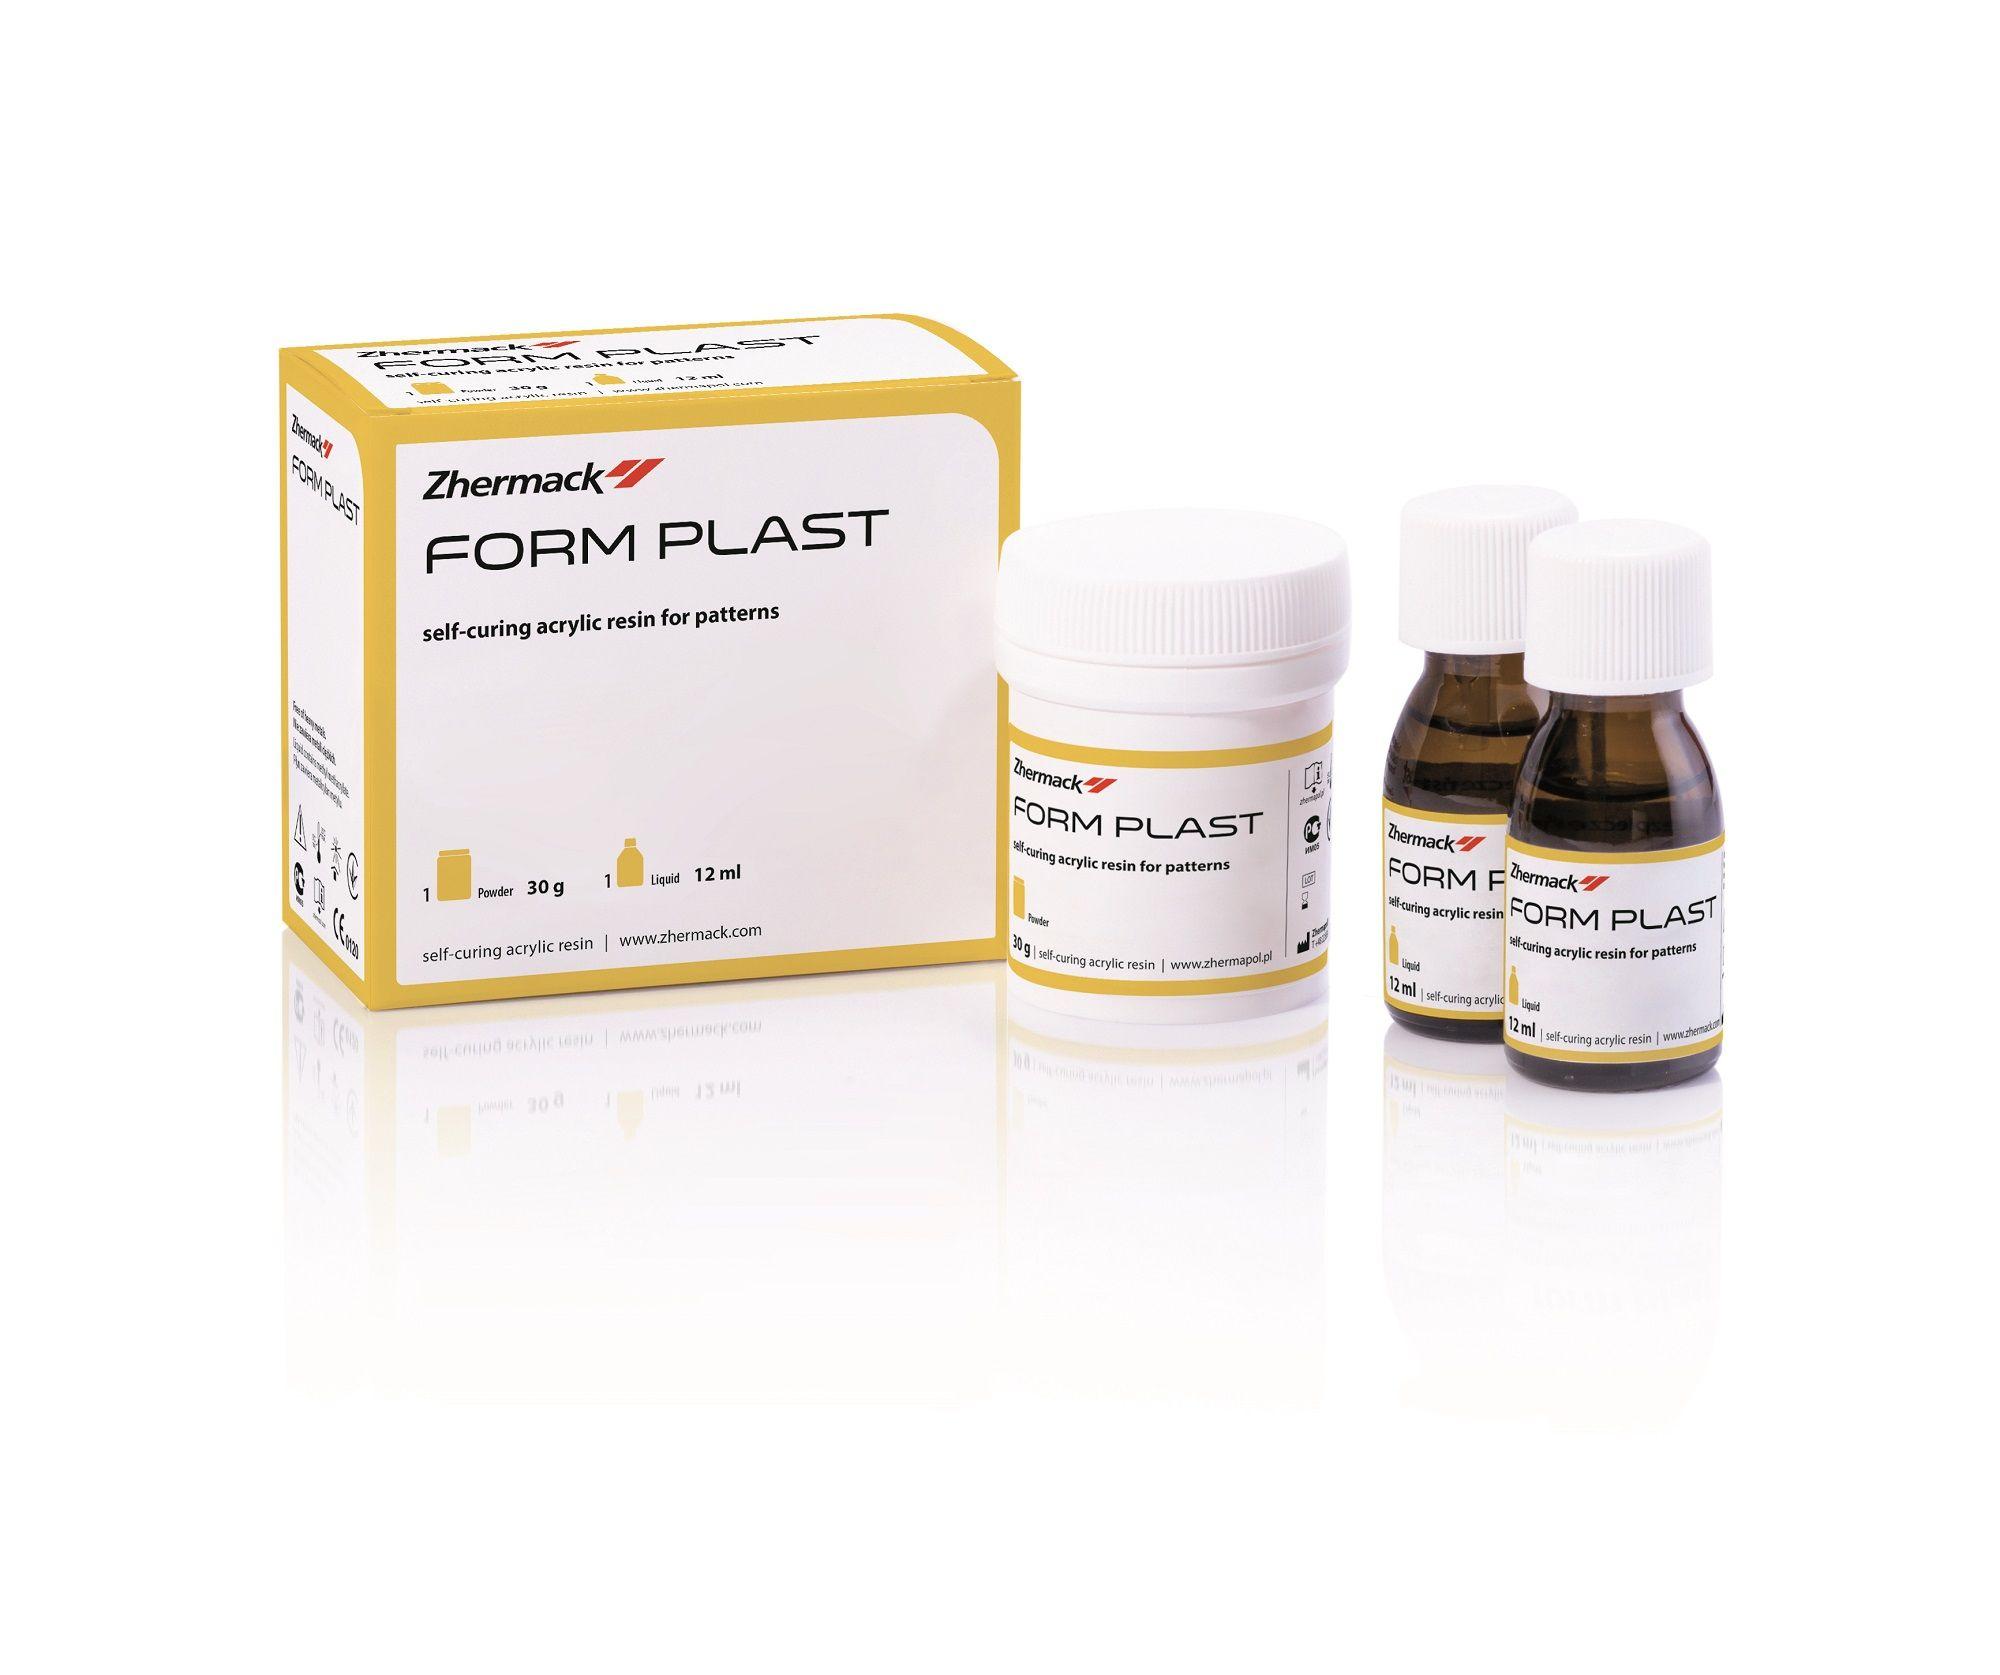 Пластмасса Form Plast 30г + 2х12мл